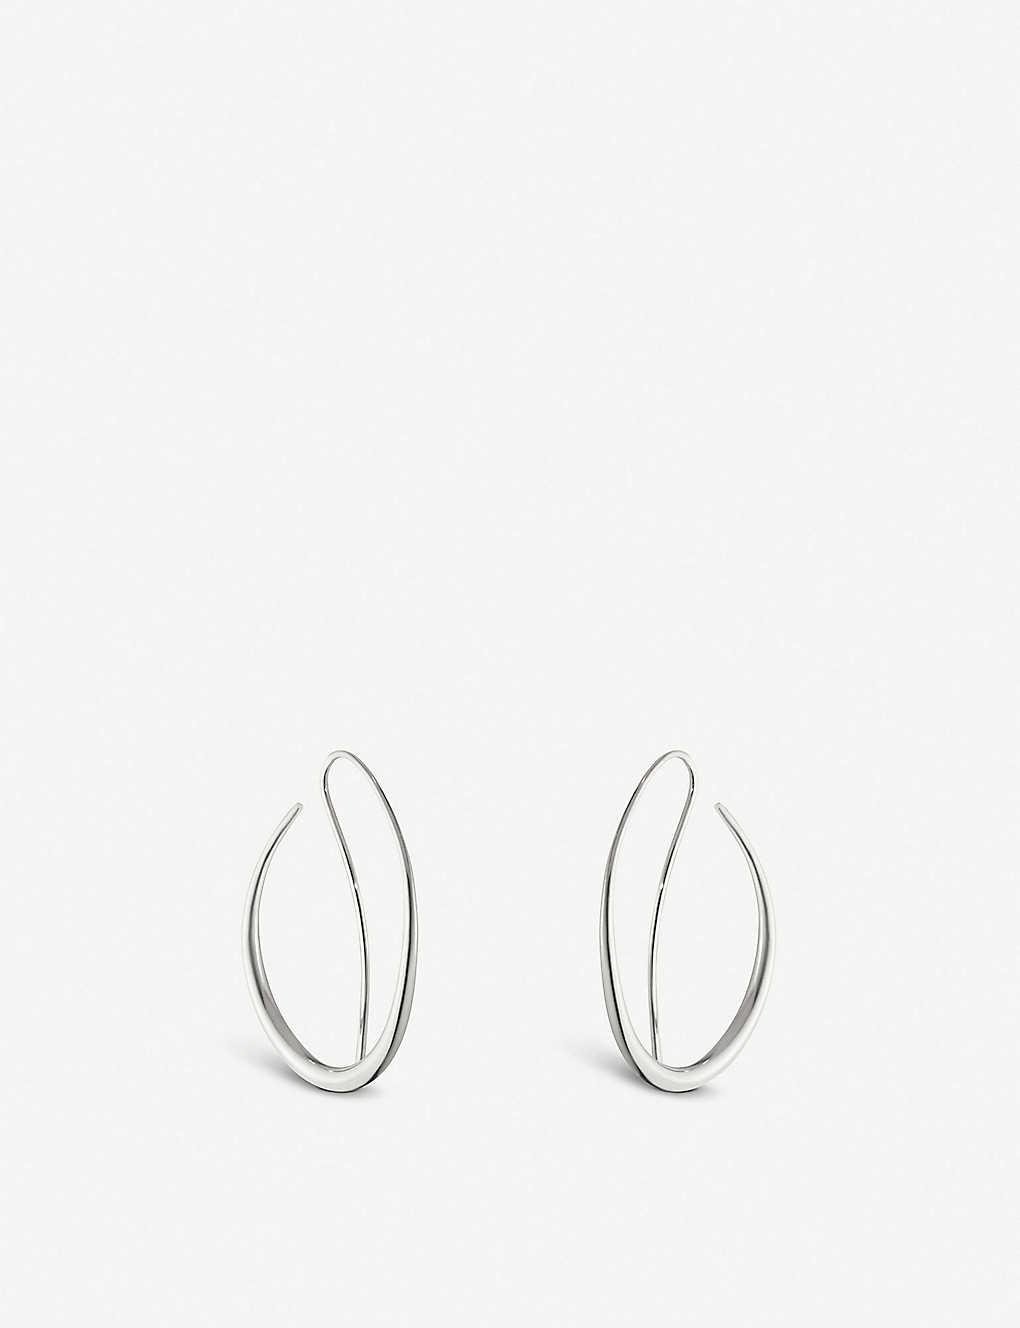 3b82cb8a6 GEORG JENSEN - Offspring sterling silver hoop earrings | Selfridges.com